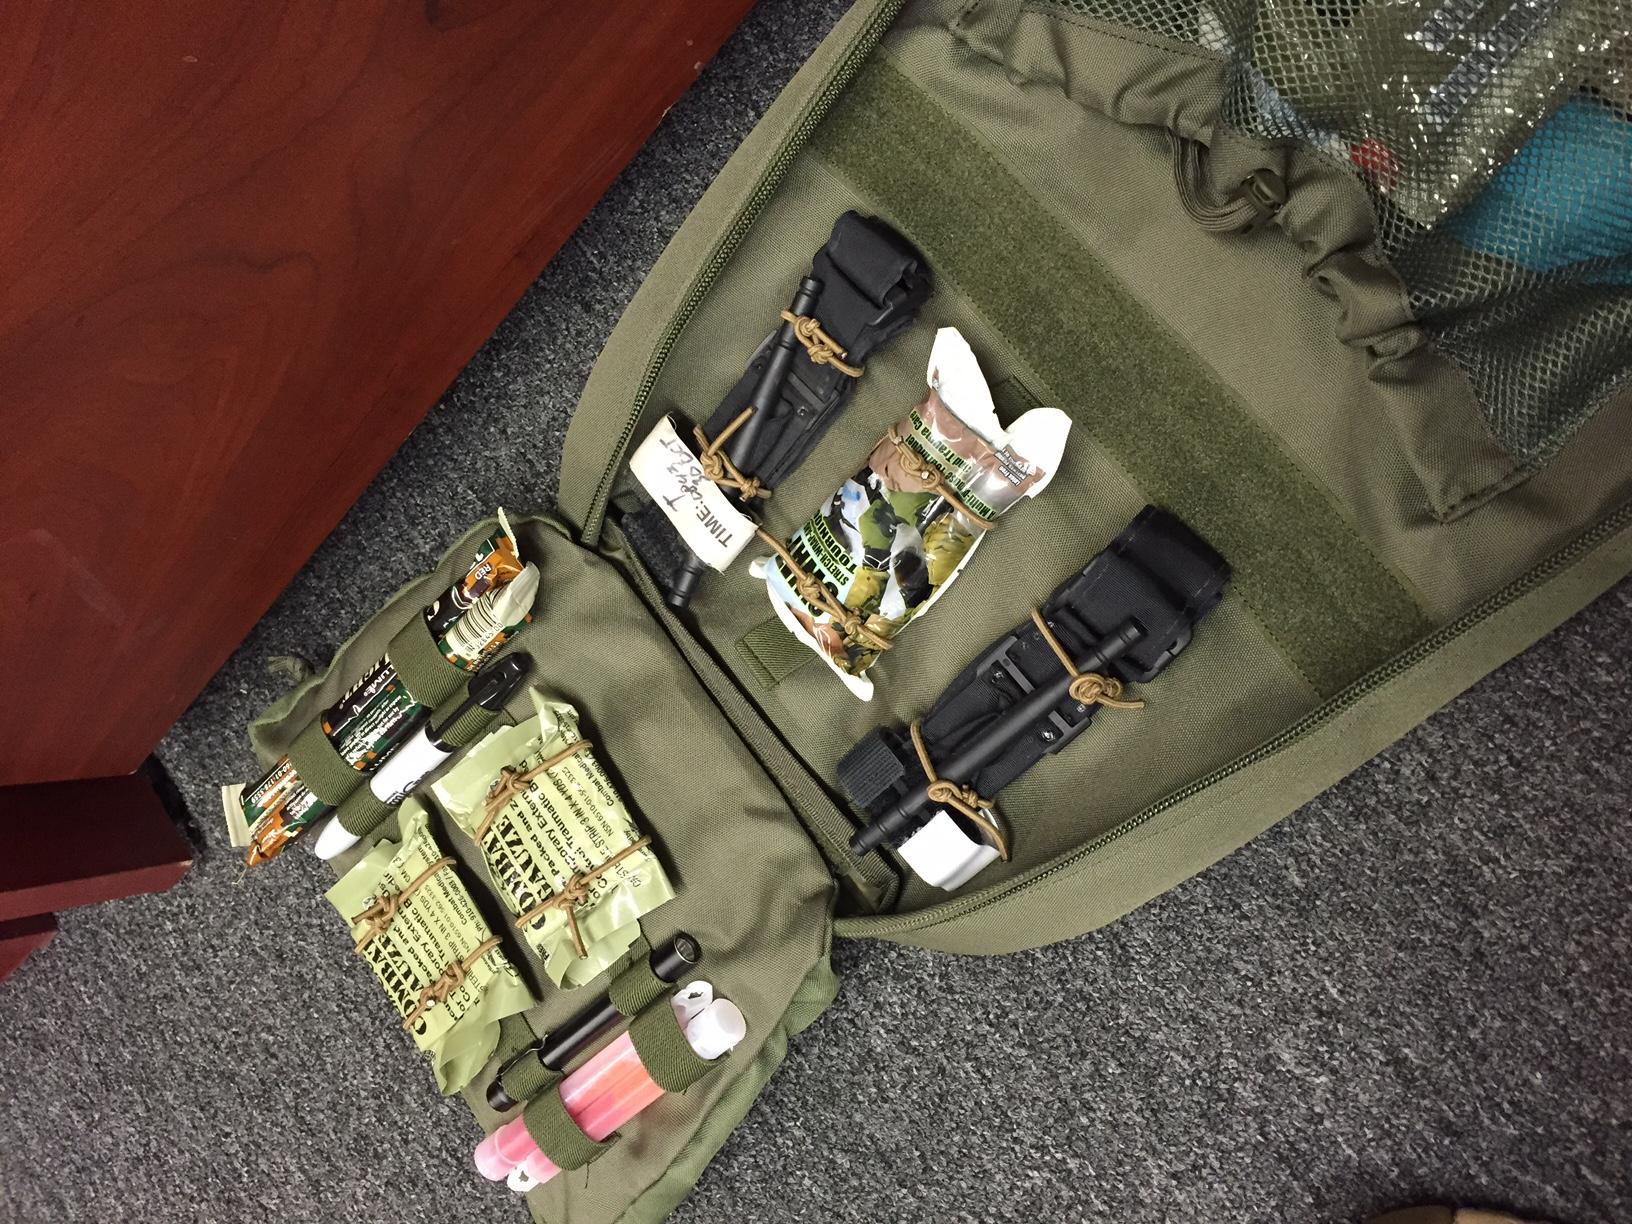 b4-sheriff-s-bag-2.jpeg